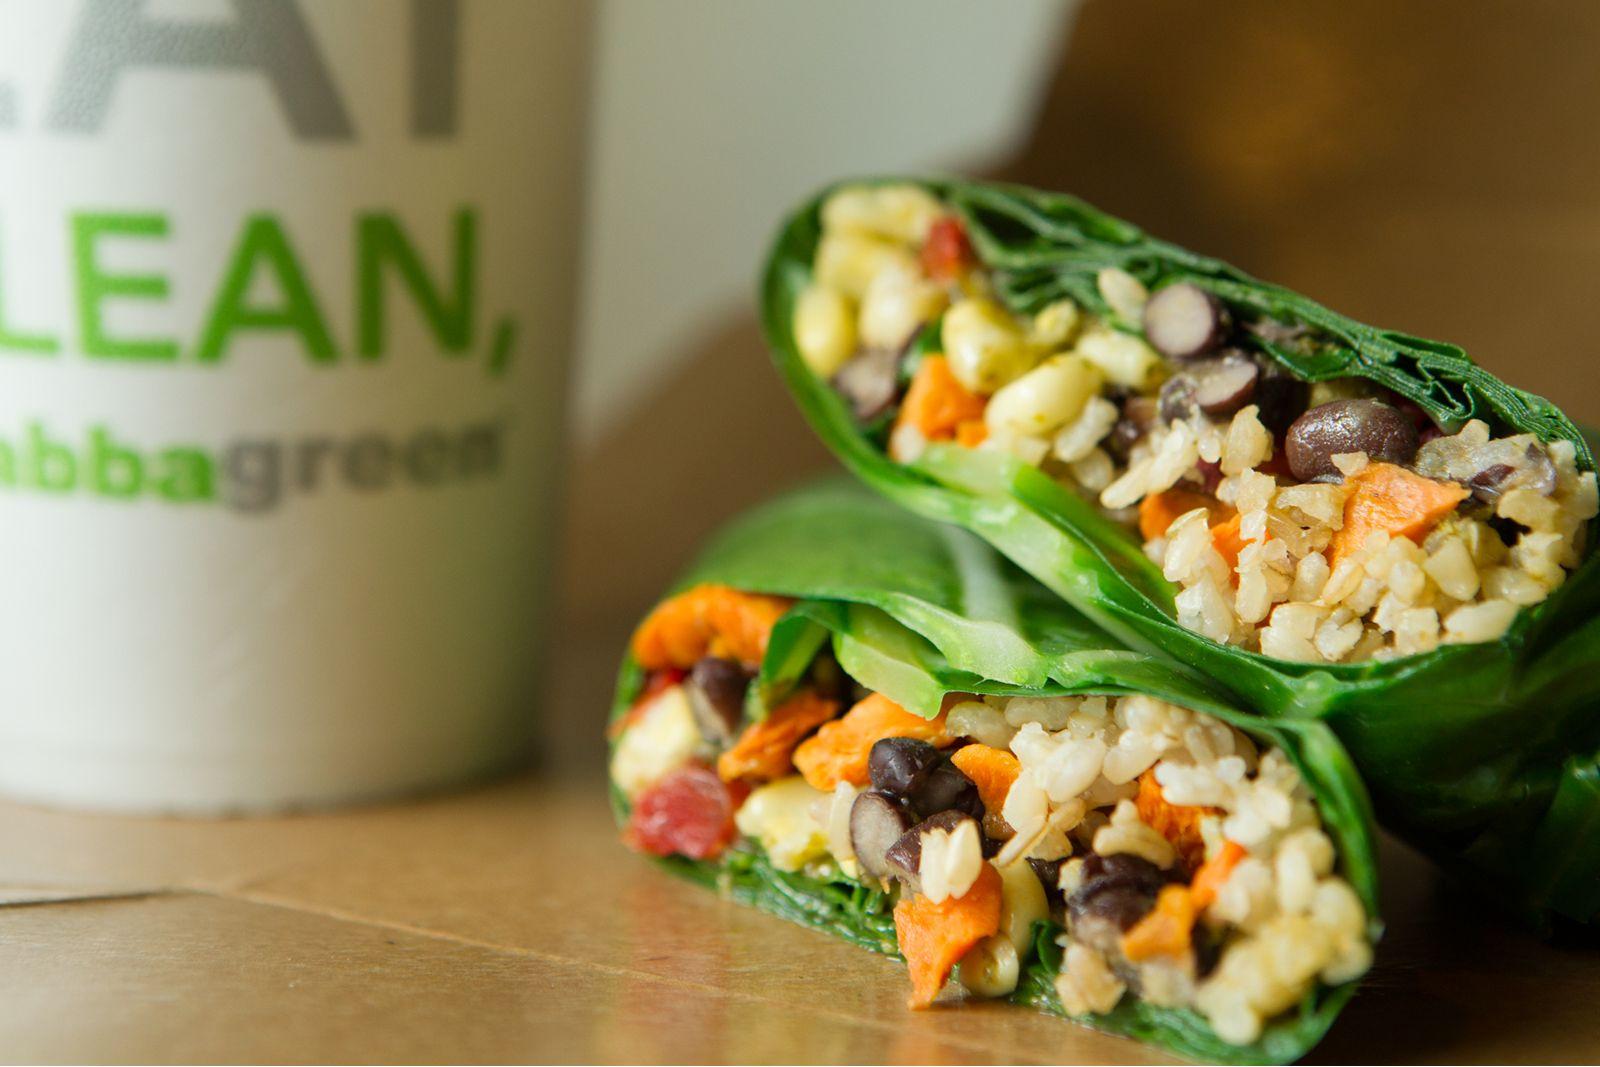 Popular Healthy Fast Food Restaurant Grabbagreen Opens In Addison